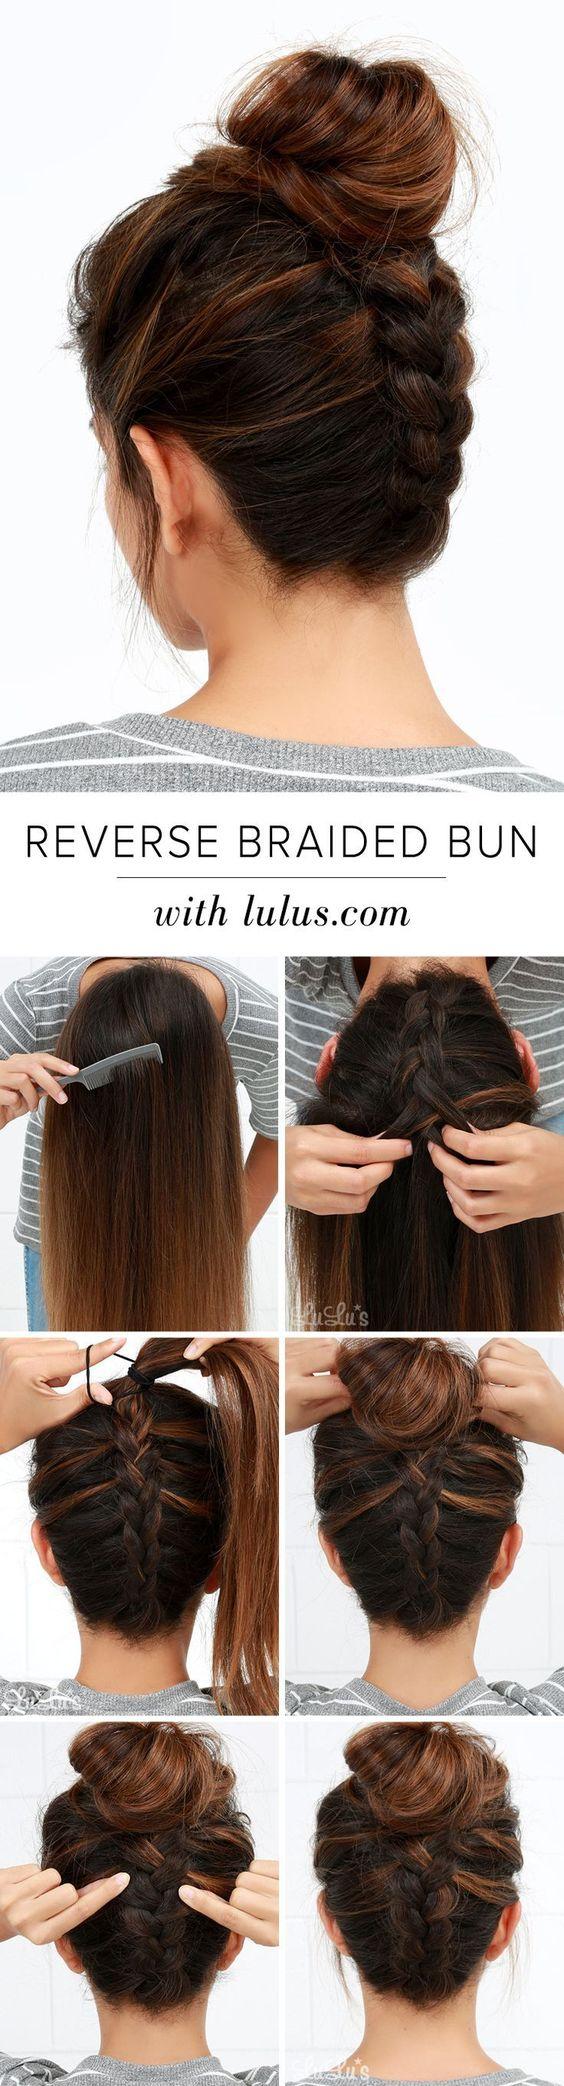 LuLu*s How-To: Reverse Braided Bun Hair Tutorial at www.lulus.com!